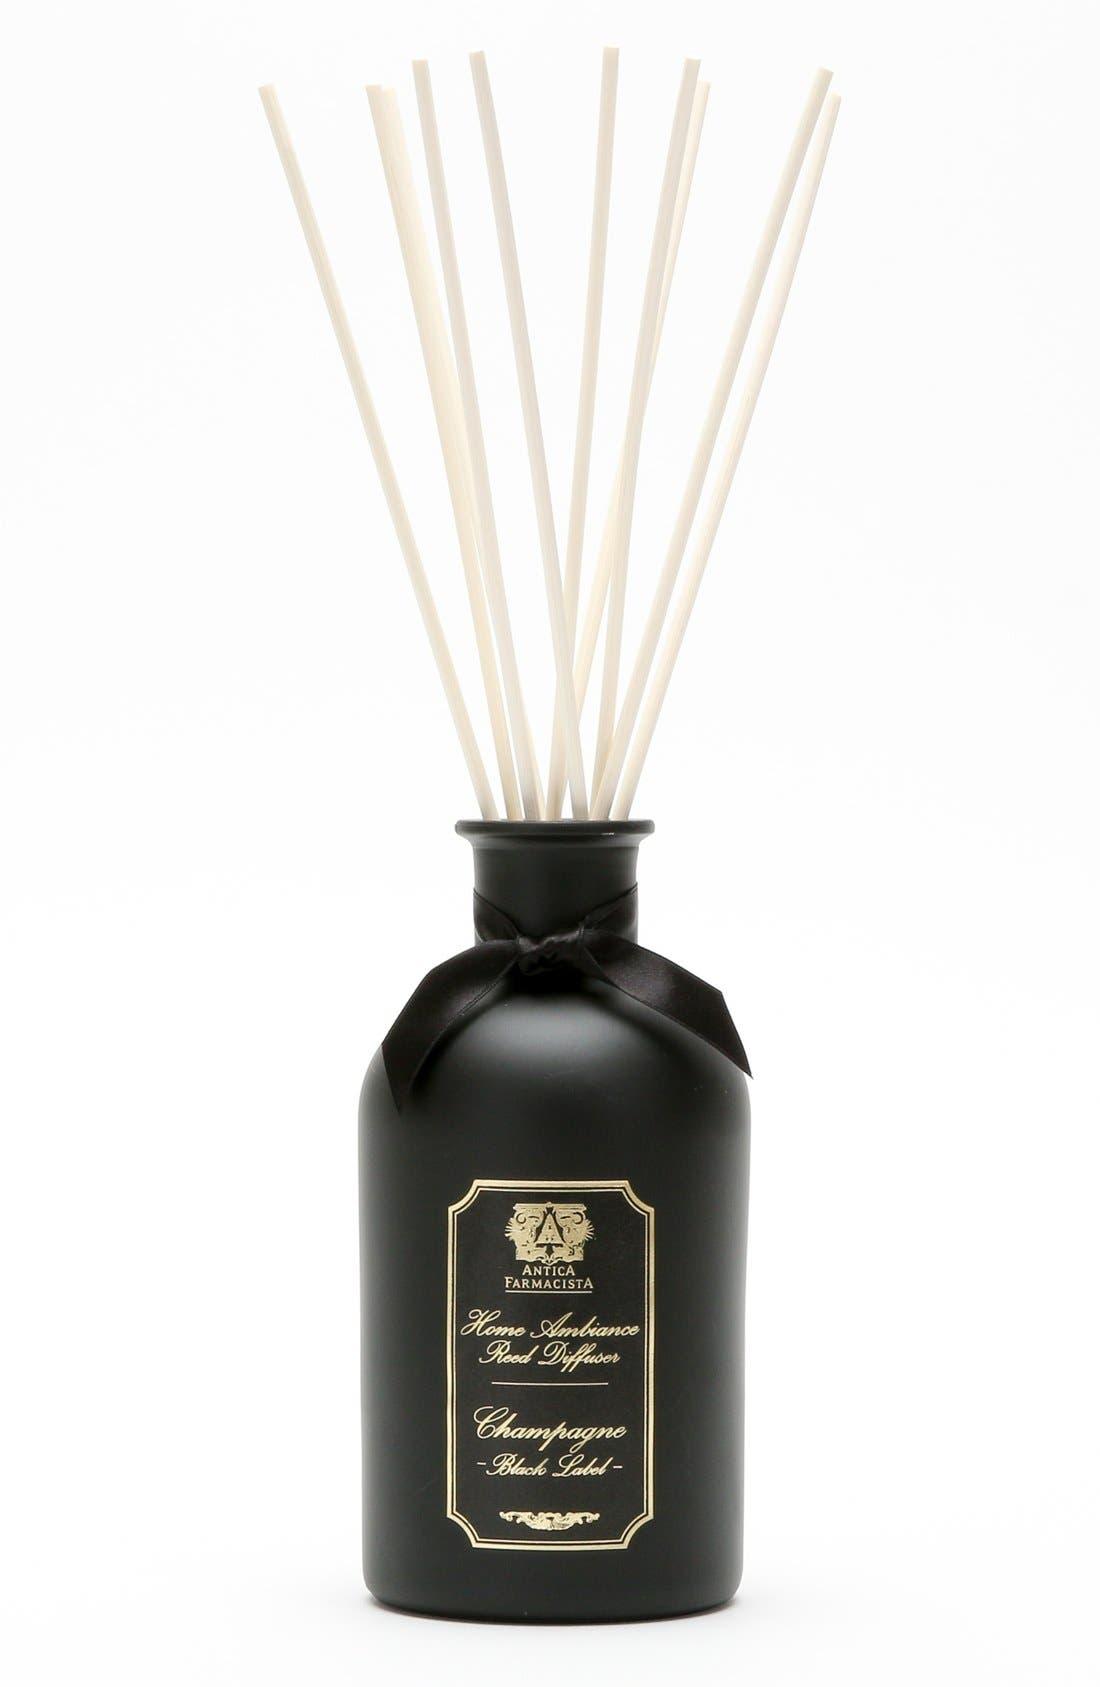 Antica Farmacista 'Black Label - Champagne' Home Ambiance Perfume (Limited Edition)